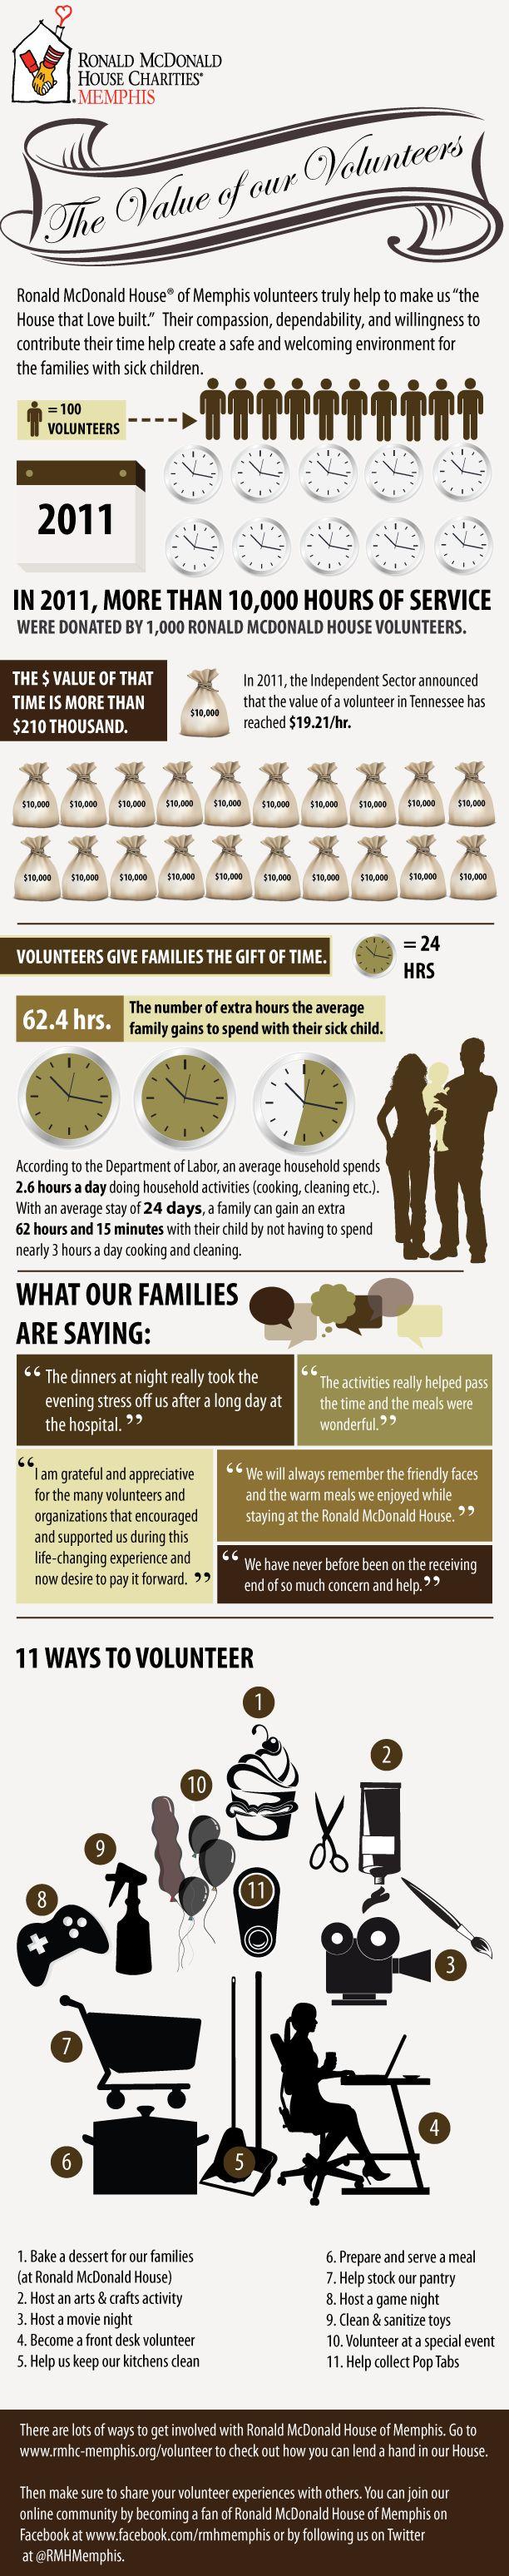 Infographic on the impact of our volunteers - happy Nat'l Volunteer Week!